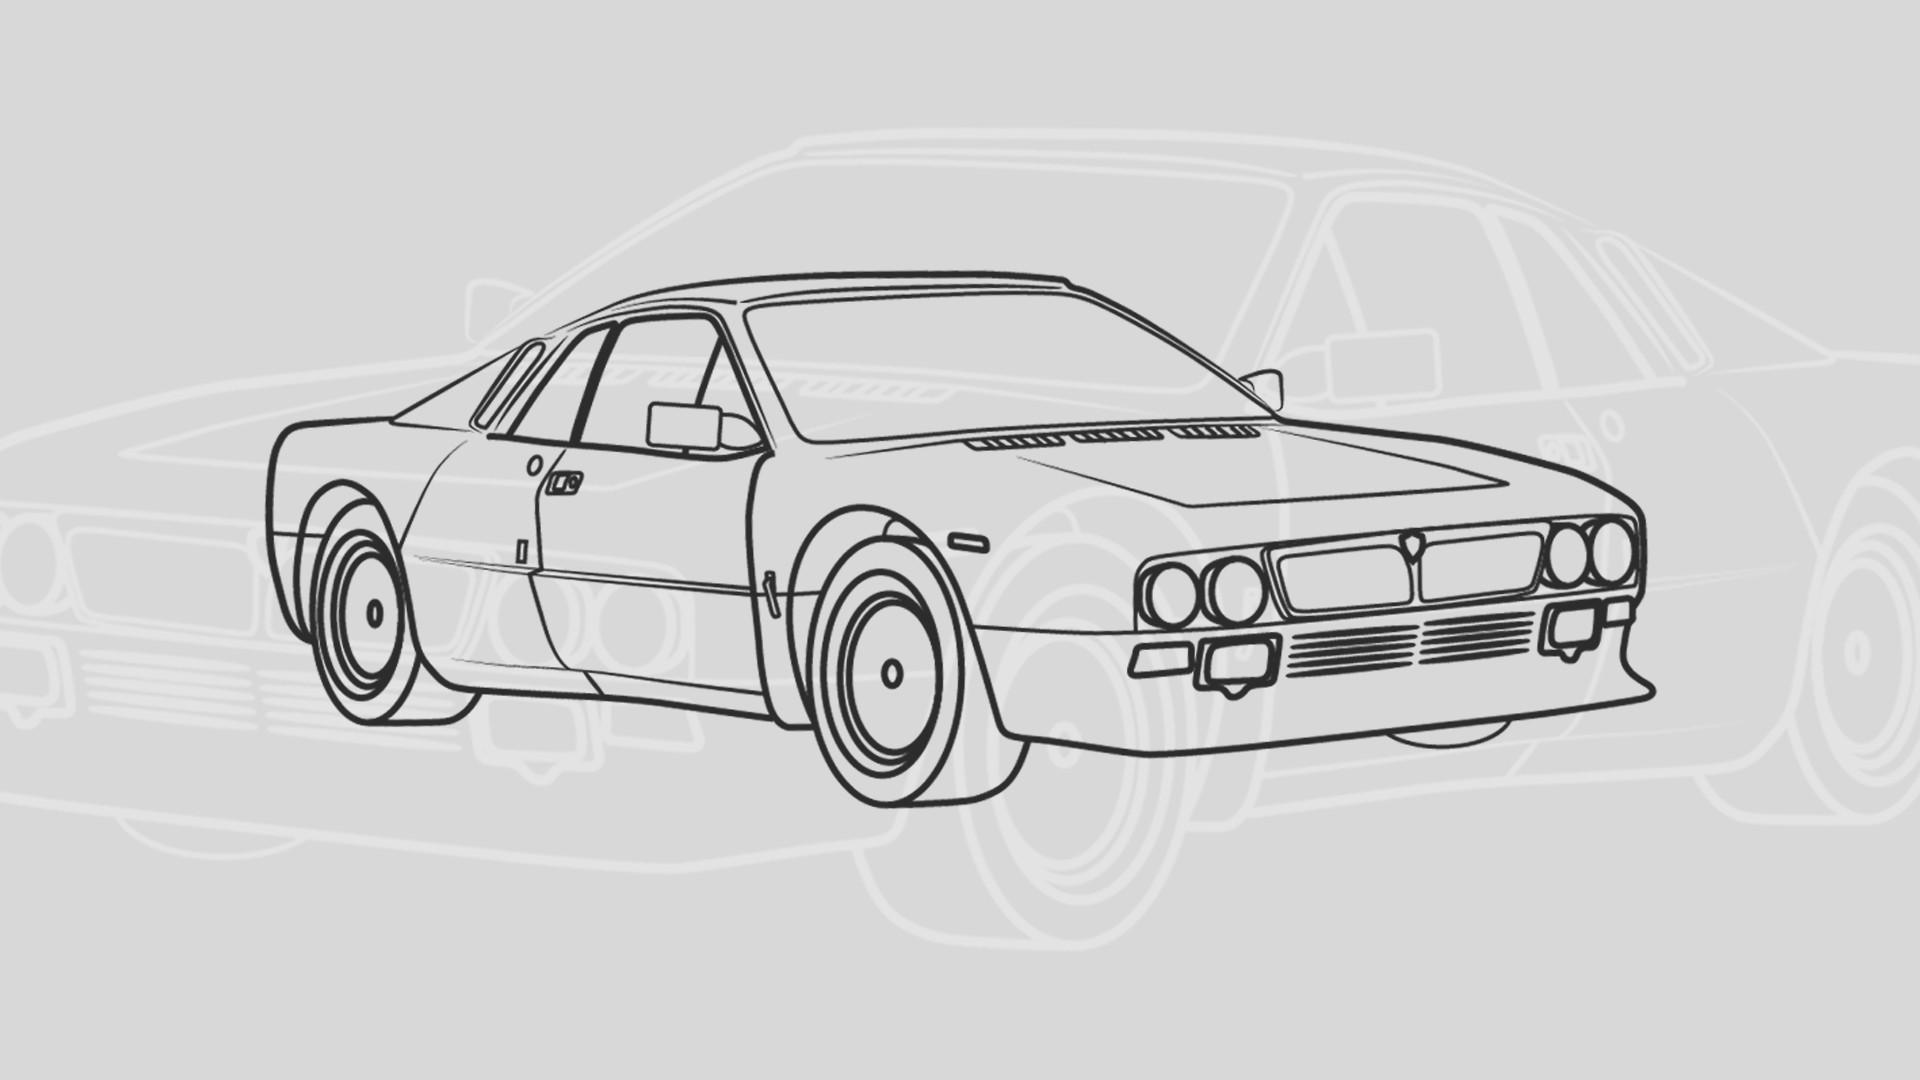 Wallpaper : drawing, illustration, vehicle, cartoon, vector, sports ...